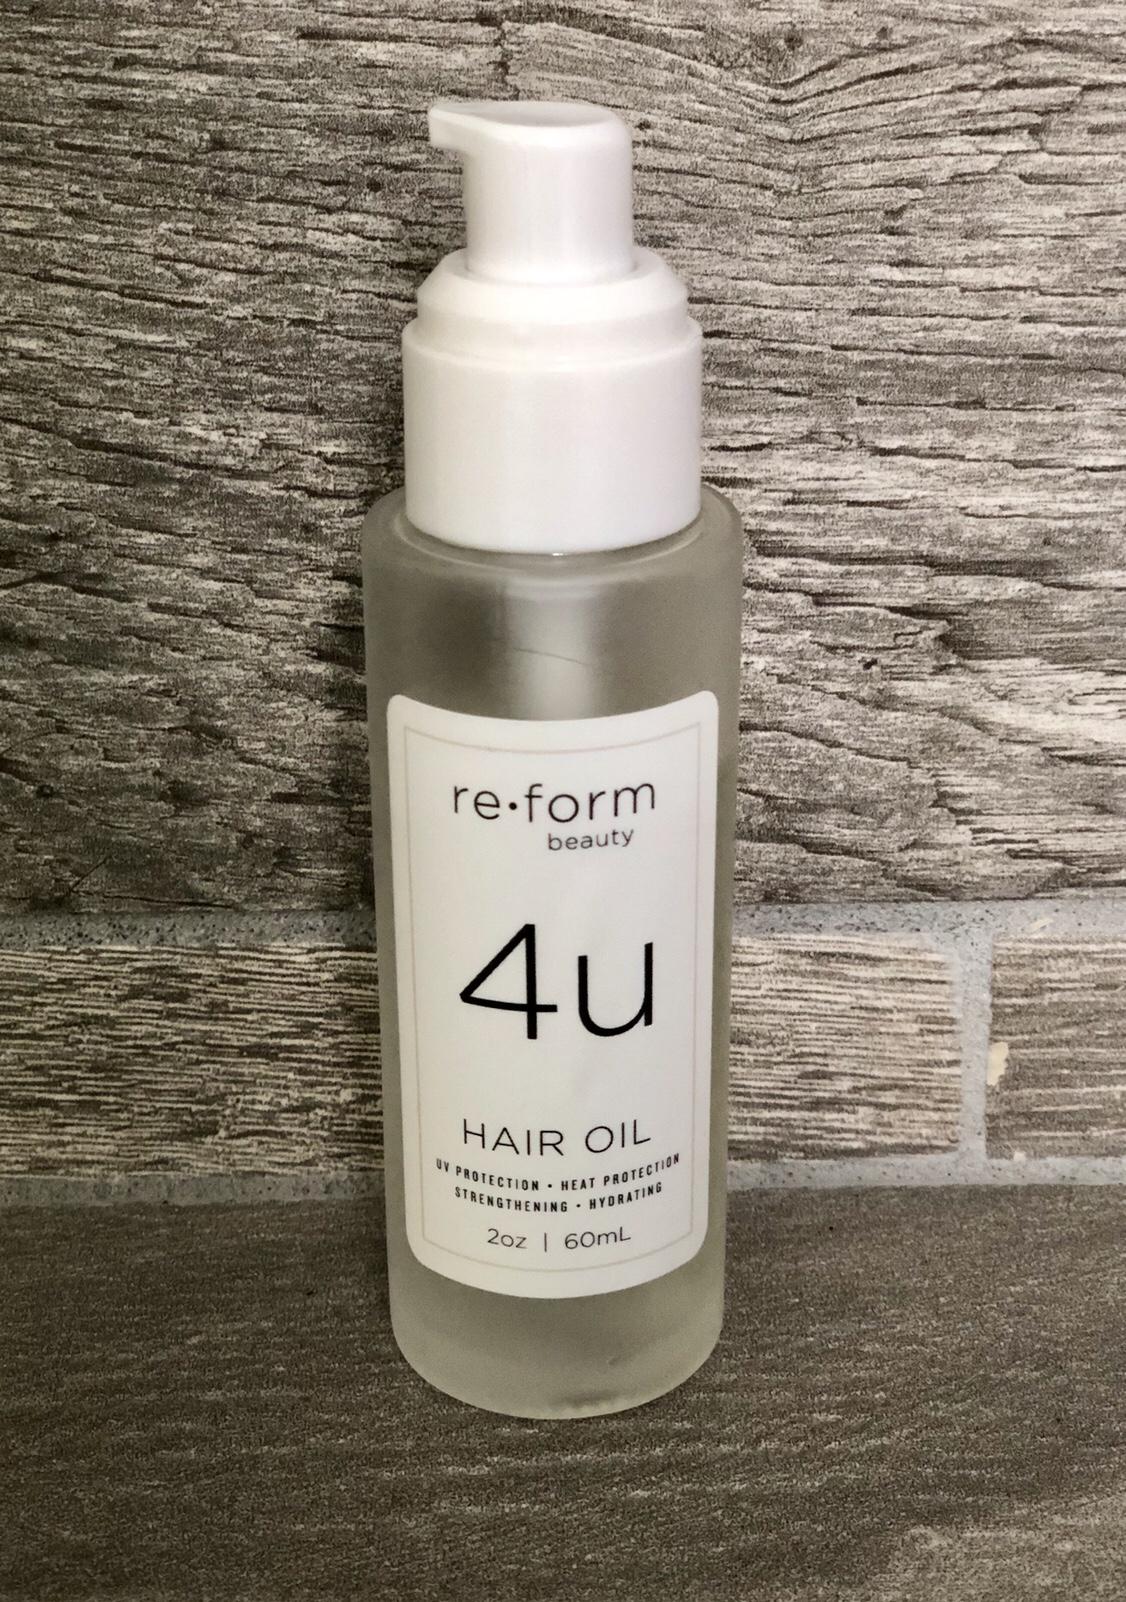 Reform Beauty 4U Hair Oil